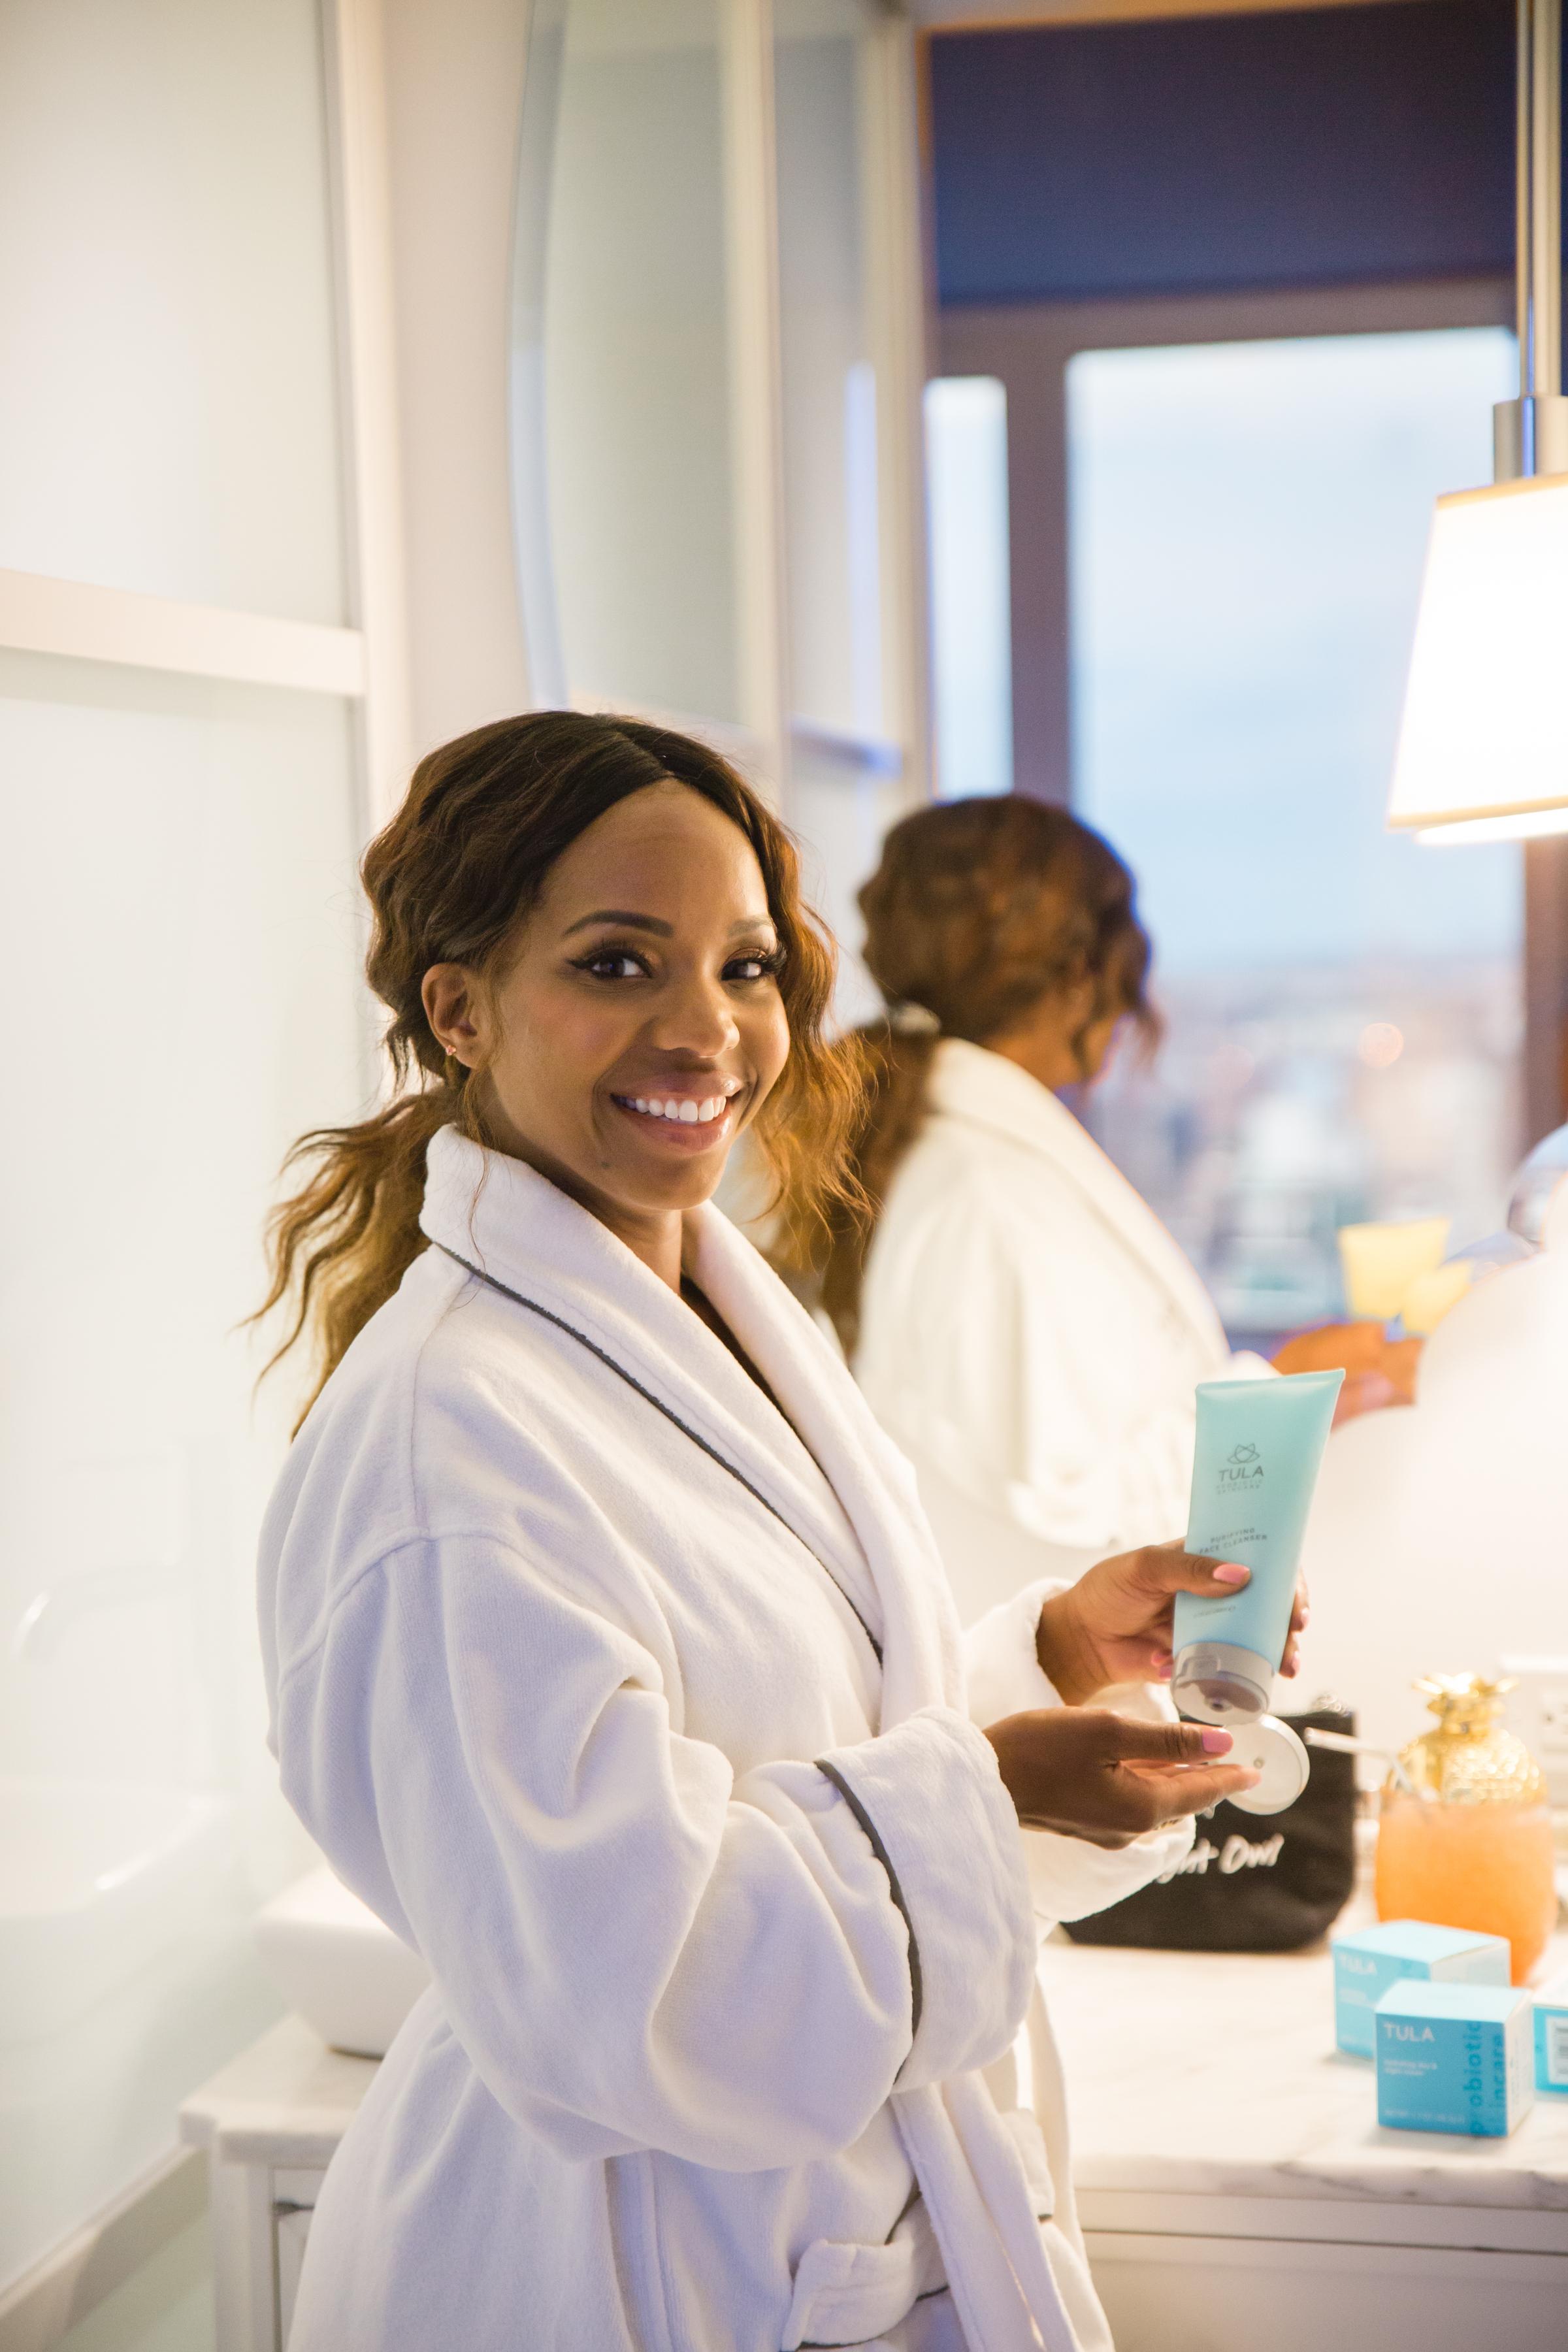 DIY Skin Care Treatments